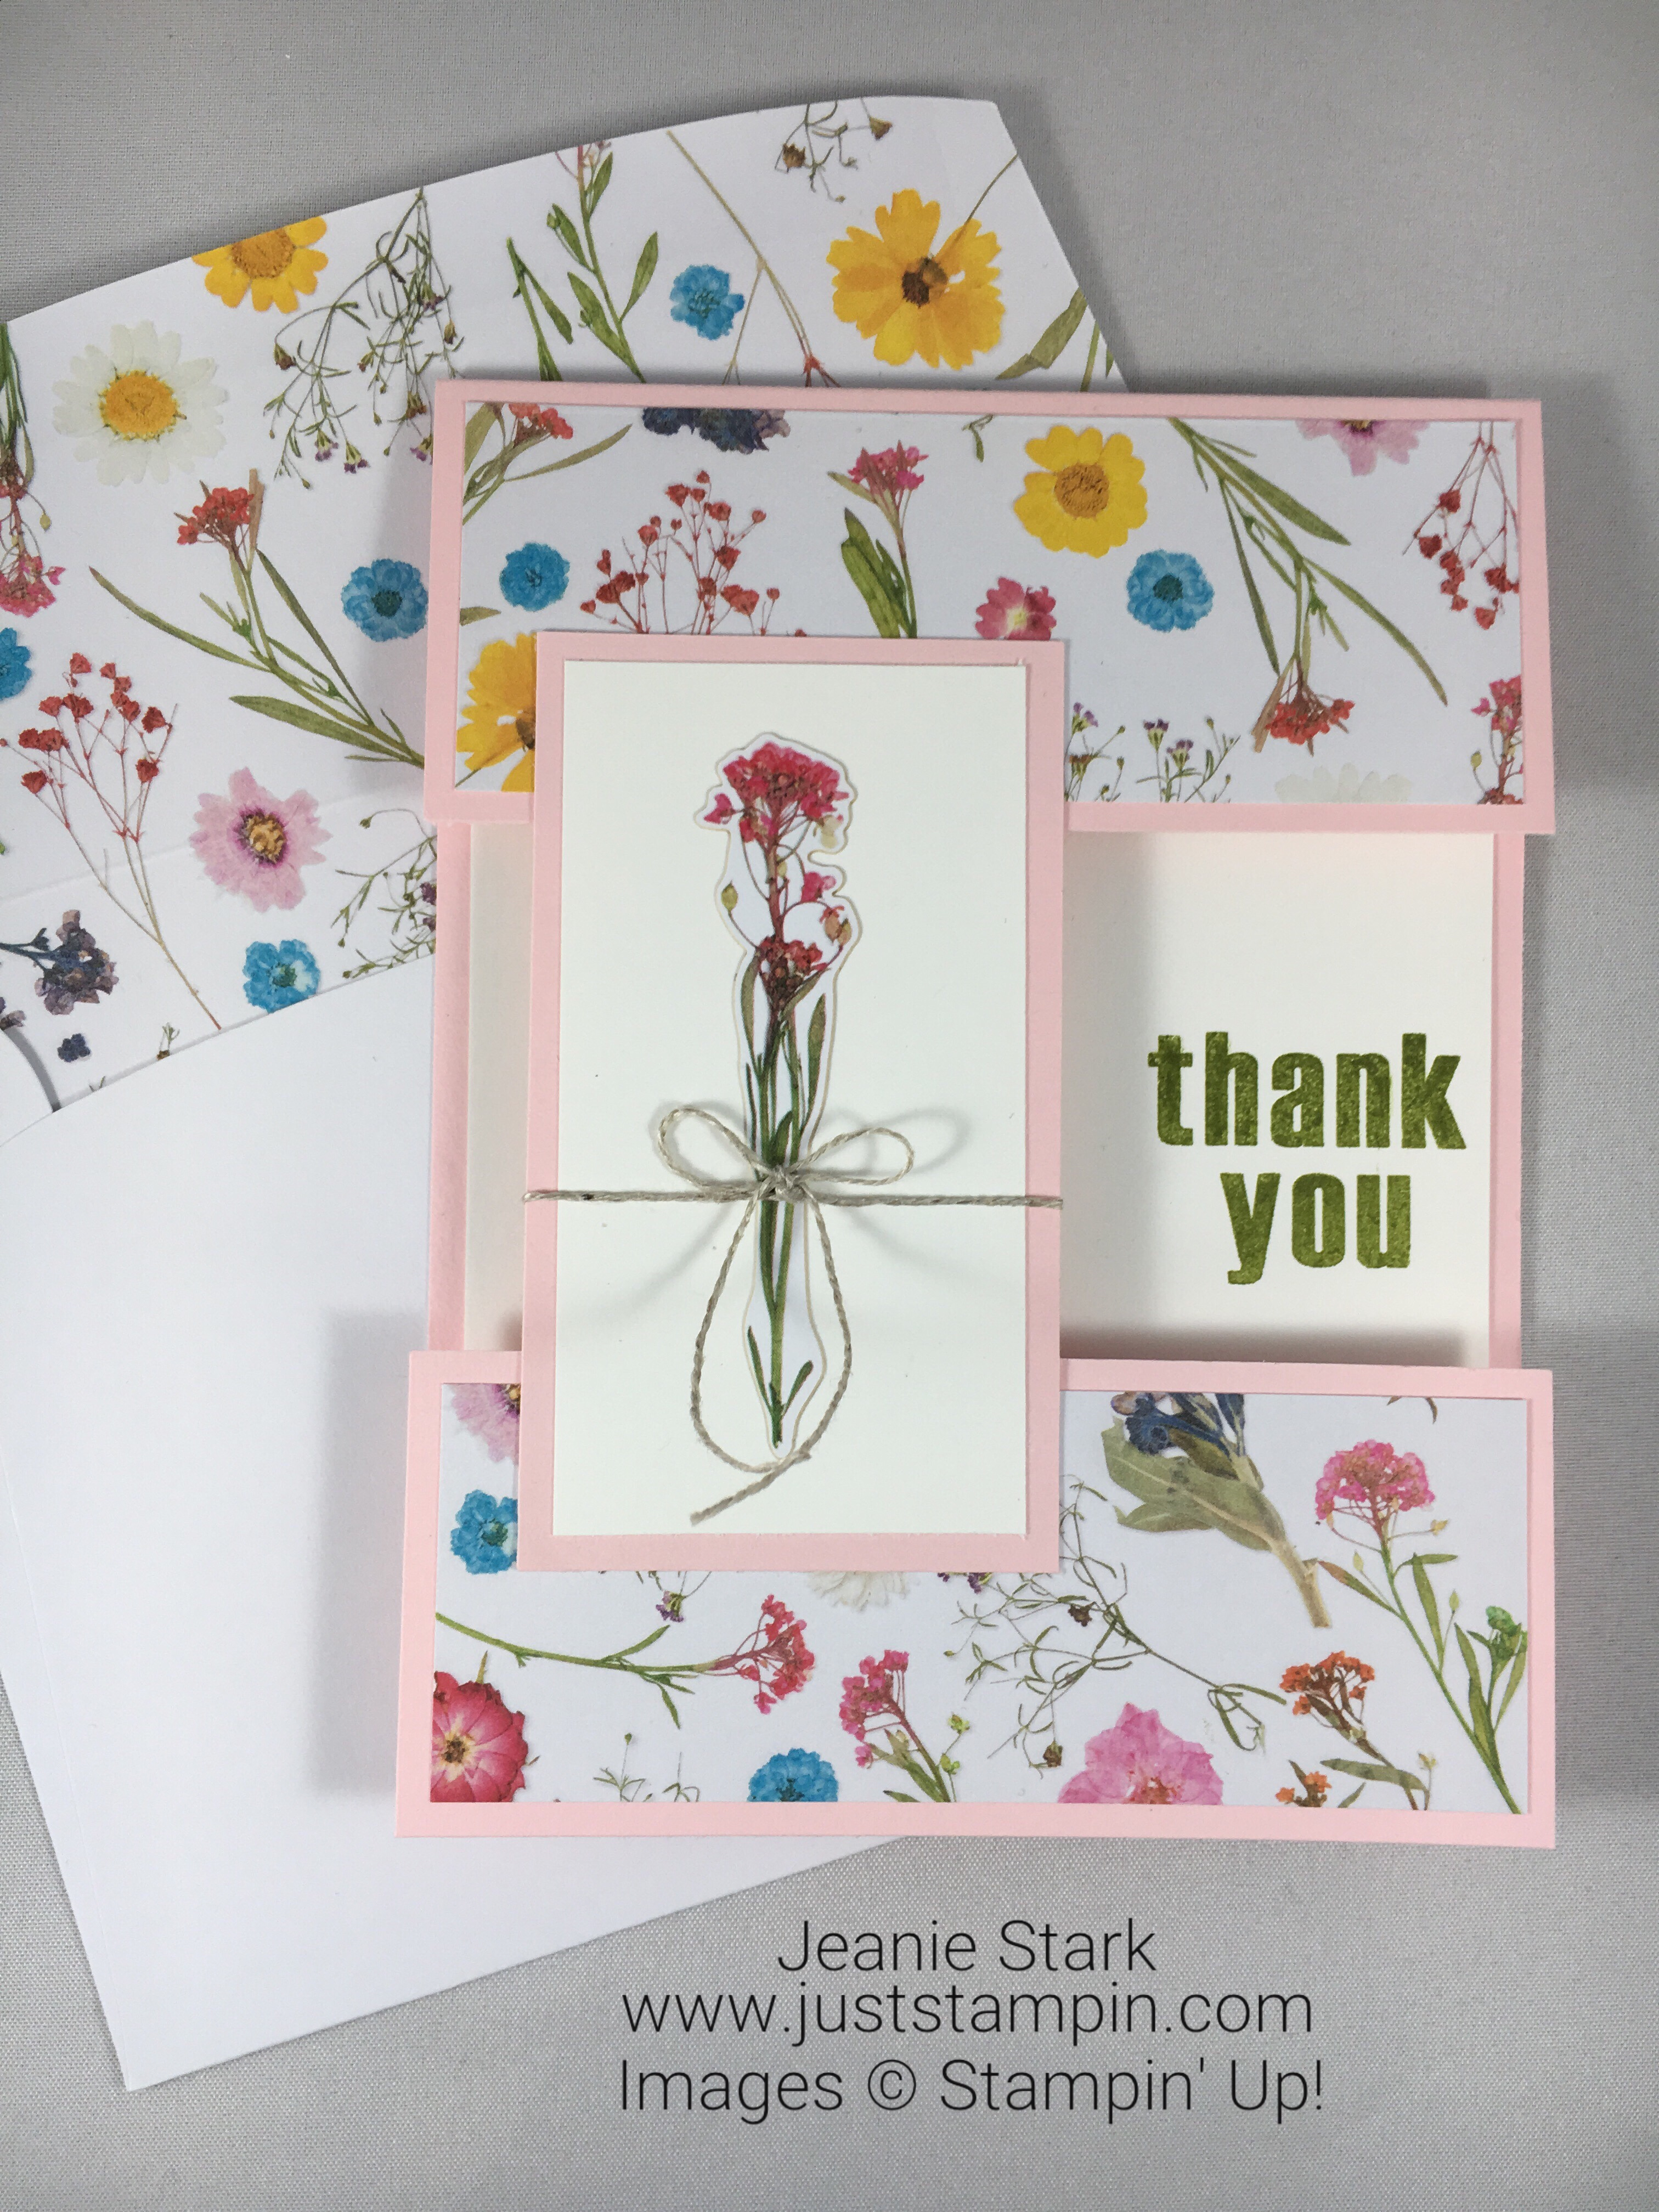 Stampin Up Paper Pumpkin Wildflower Wishes alternate thank you card idea - Jeanie Stark StampinUp